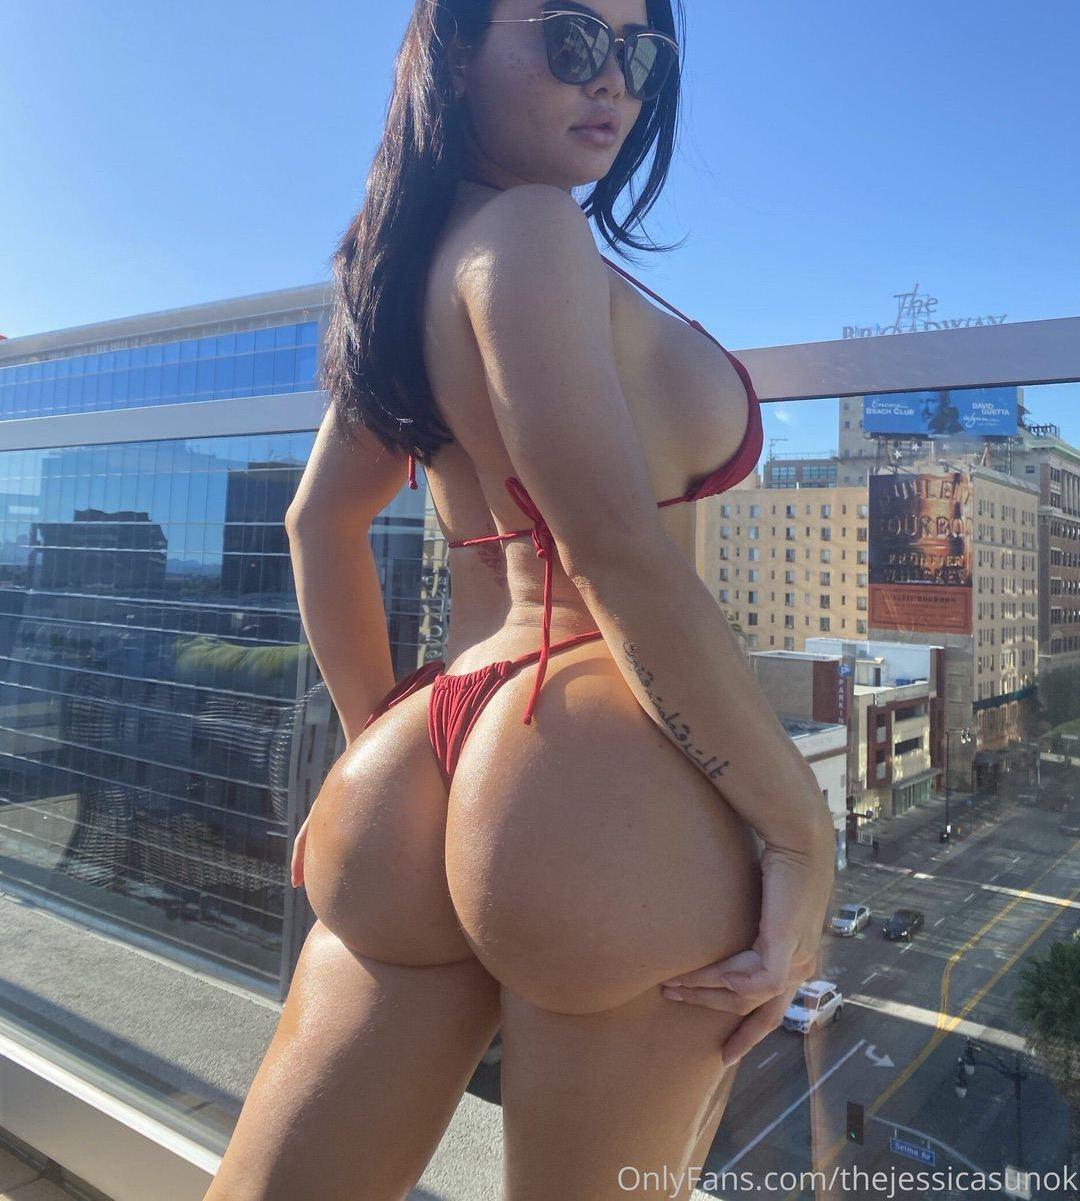 Jessica Sunok Jessicasunok Onlyfans Nudes Leaks 0002